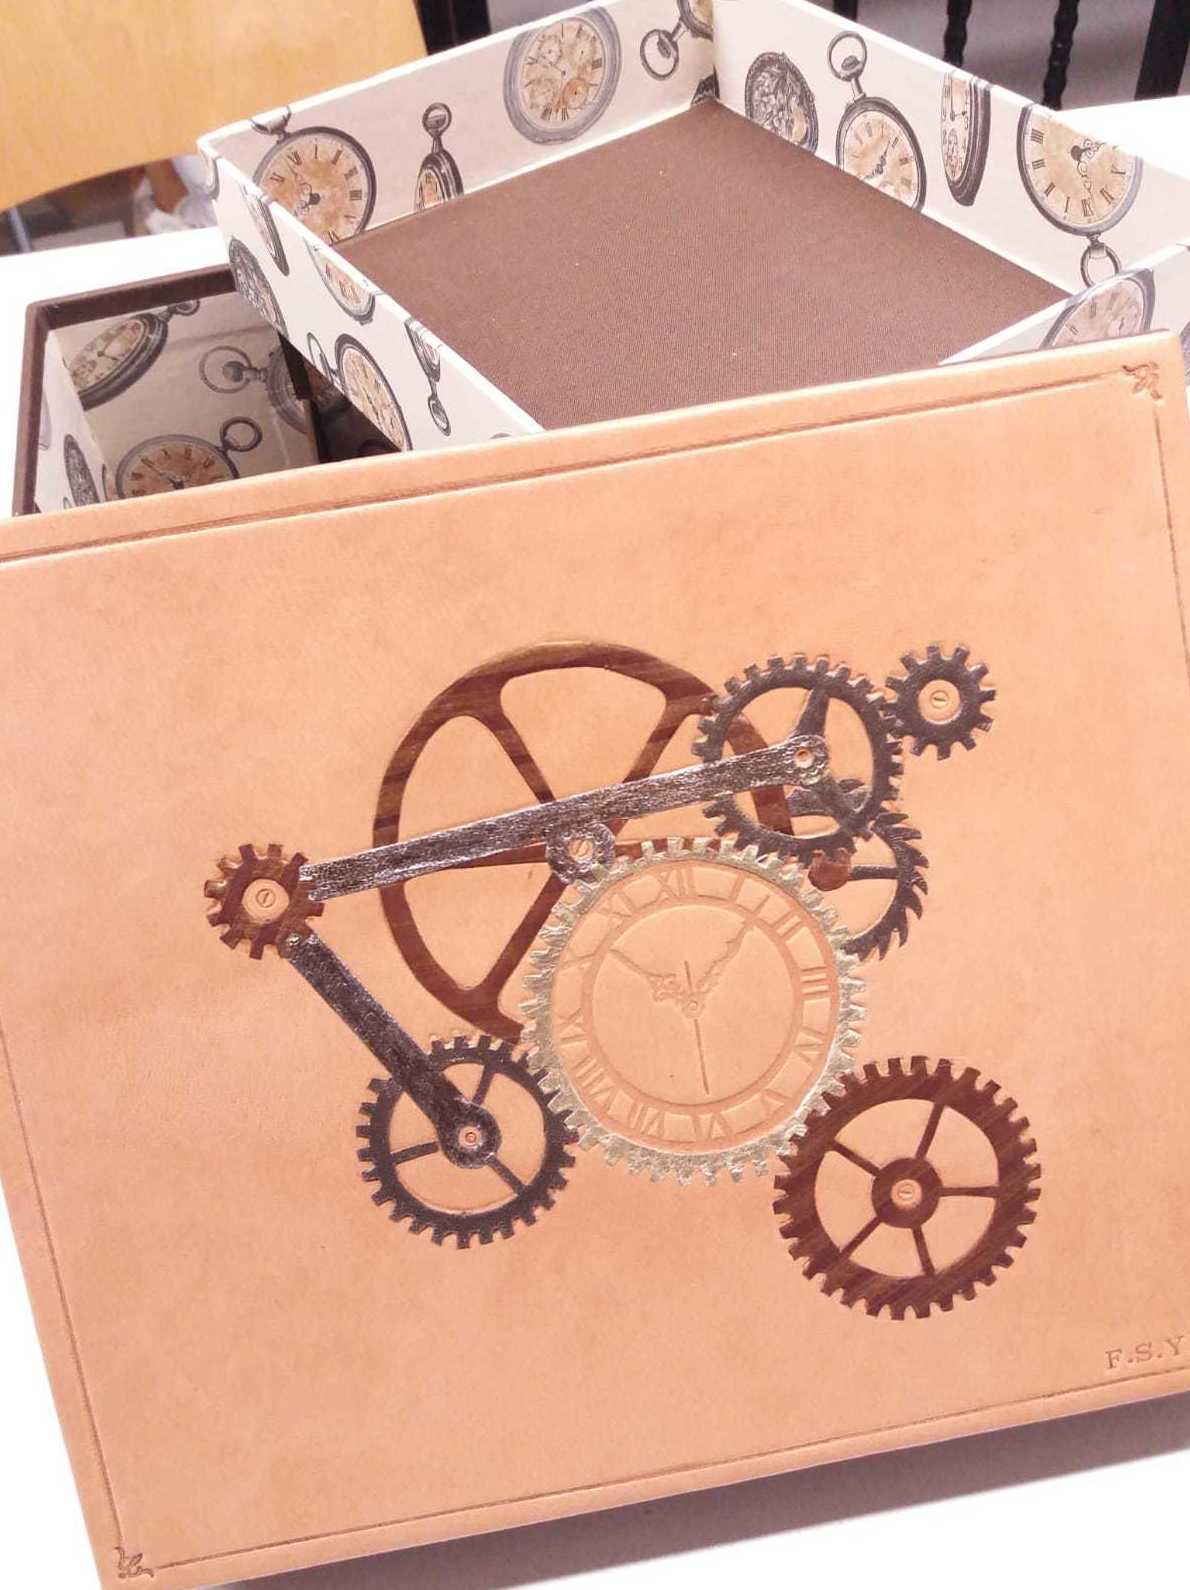 Caja para relojes con tapa de piel zumaque decorada con mosaico de pieles metalizadas.